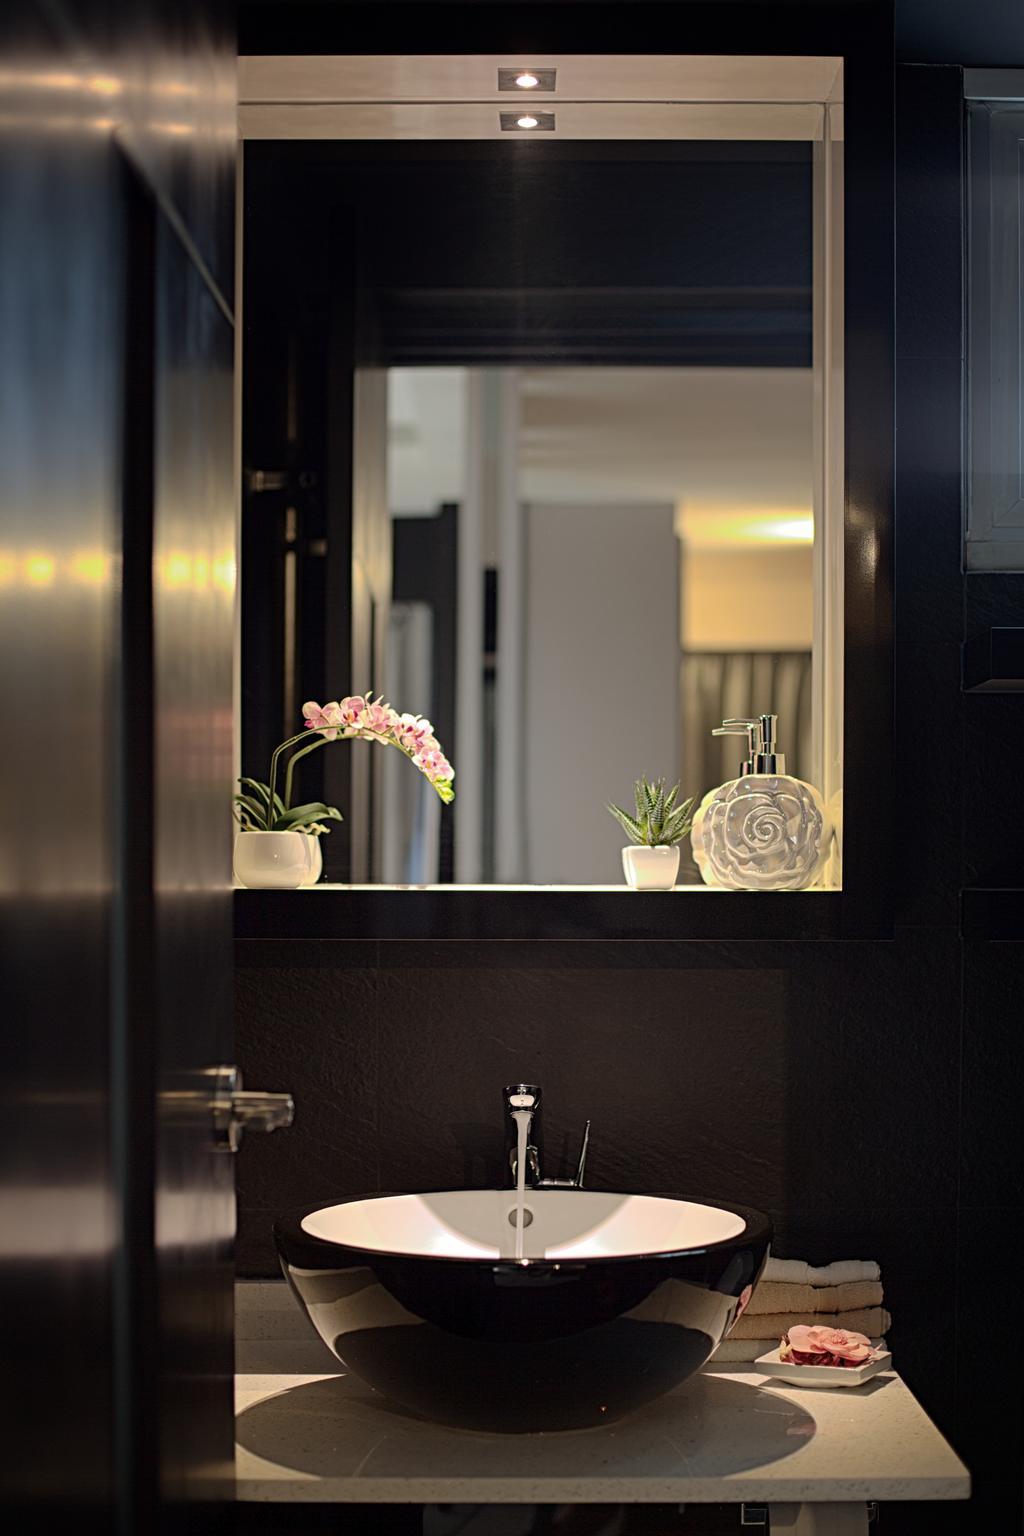 HDB, Sumang Link, Interior Designer, Weiken.com, Flora, Jar, Plant, Potted Plant, Pottery, Vase, Art, Blossom, Flower, Flower Arrangement, Ikebana, Ornament